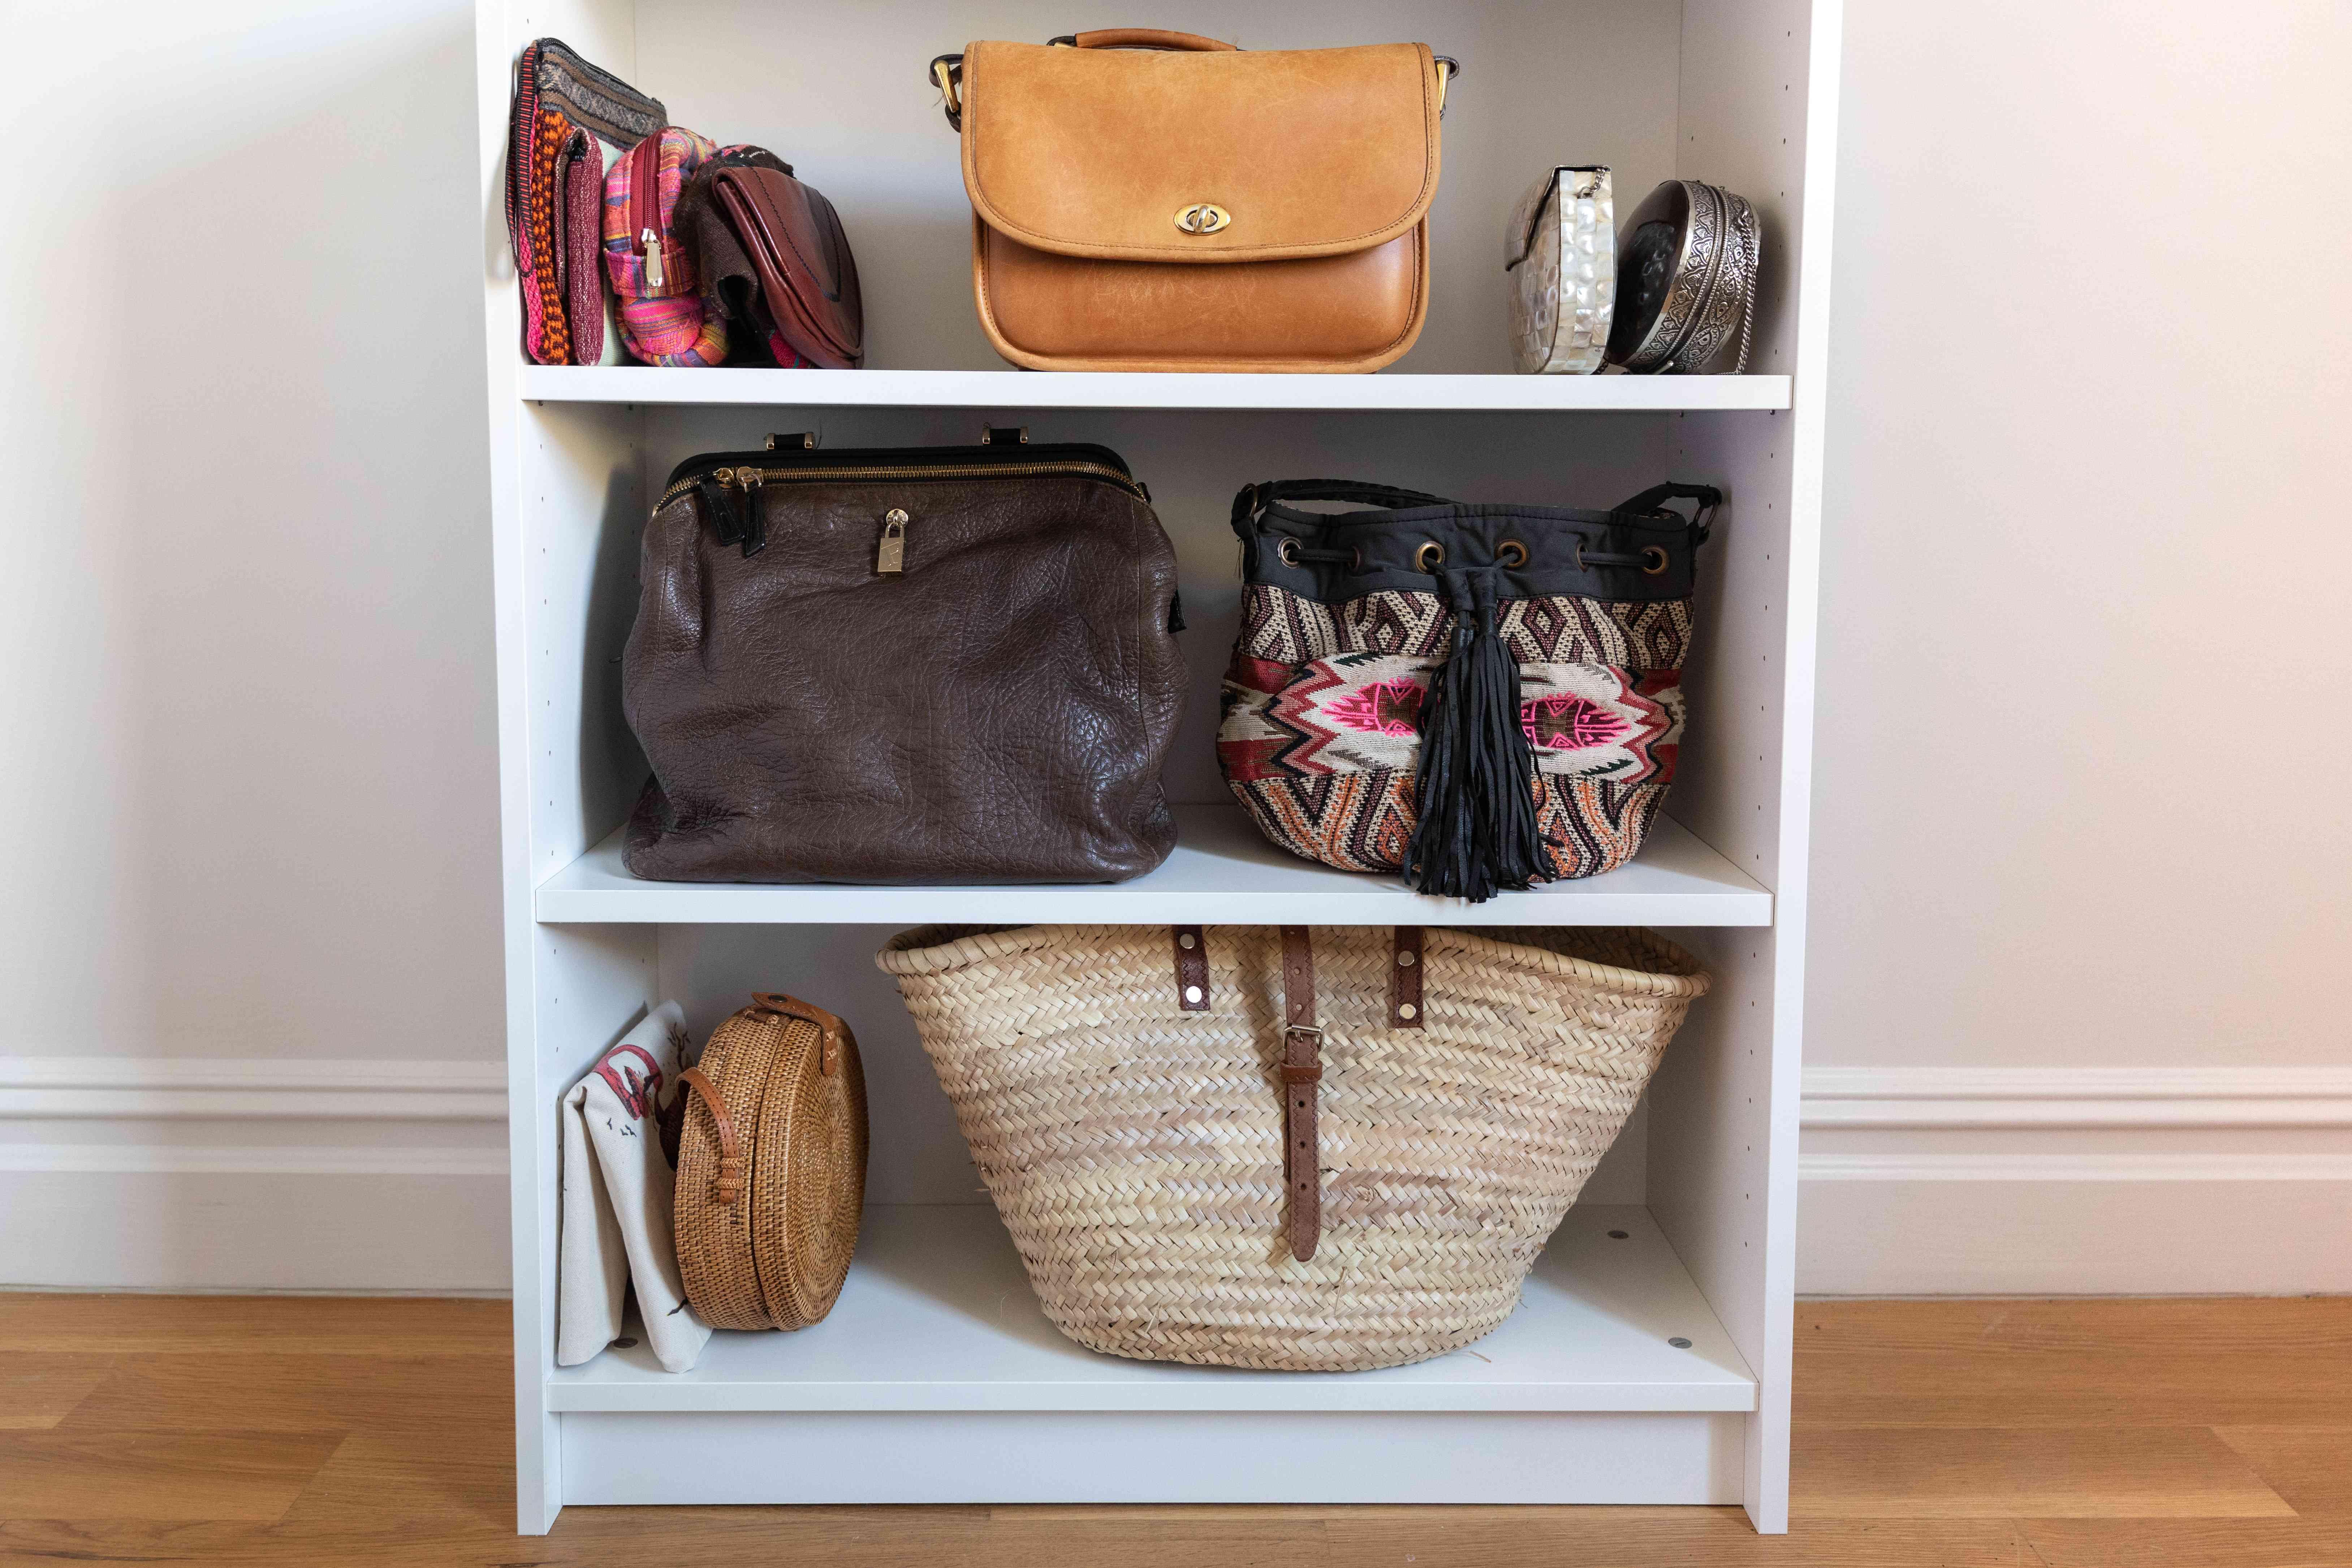 bookcase holding handbags